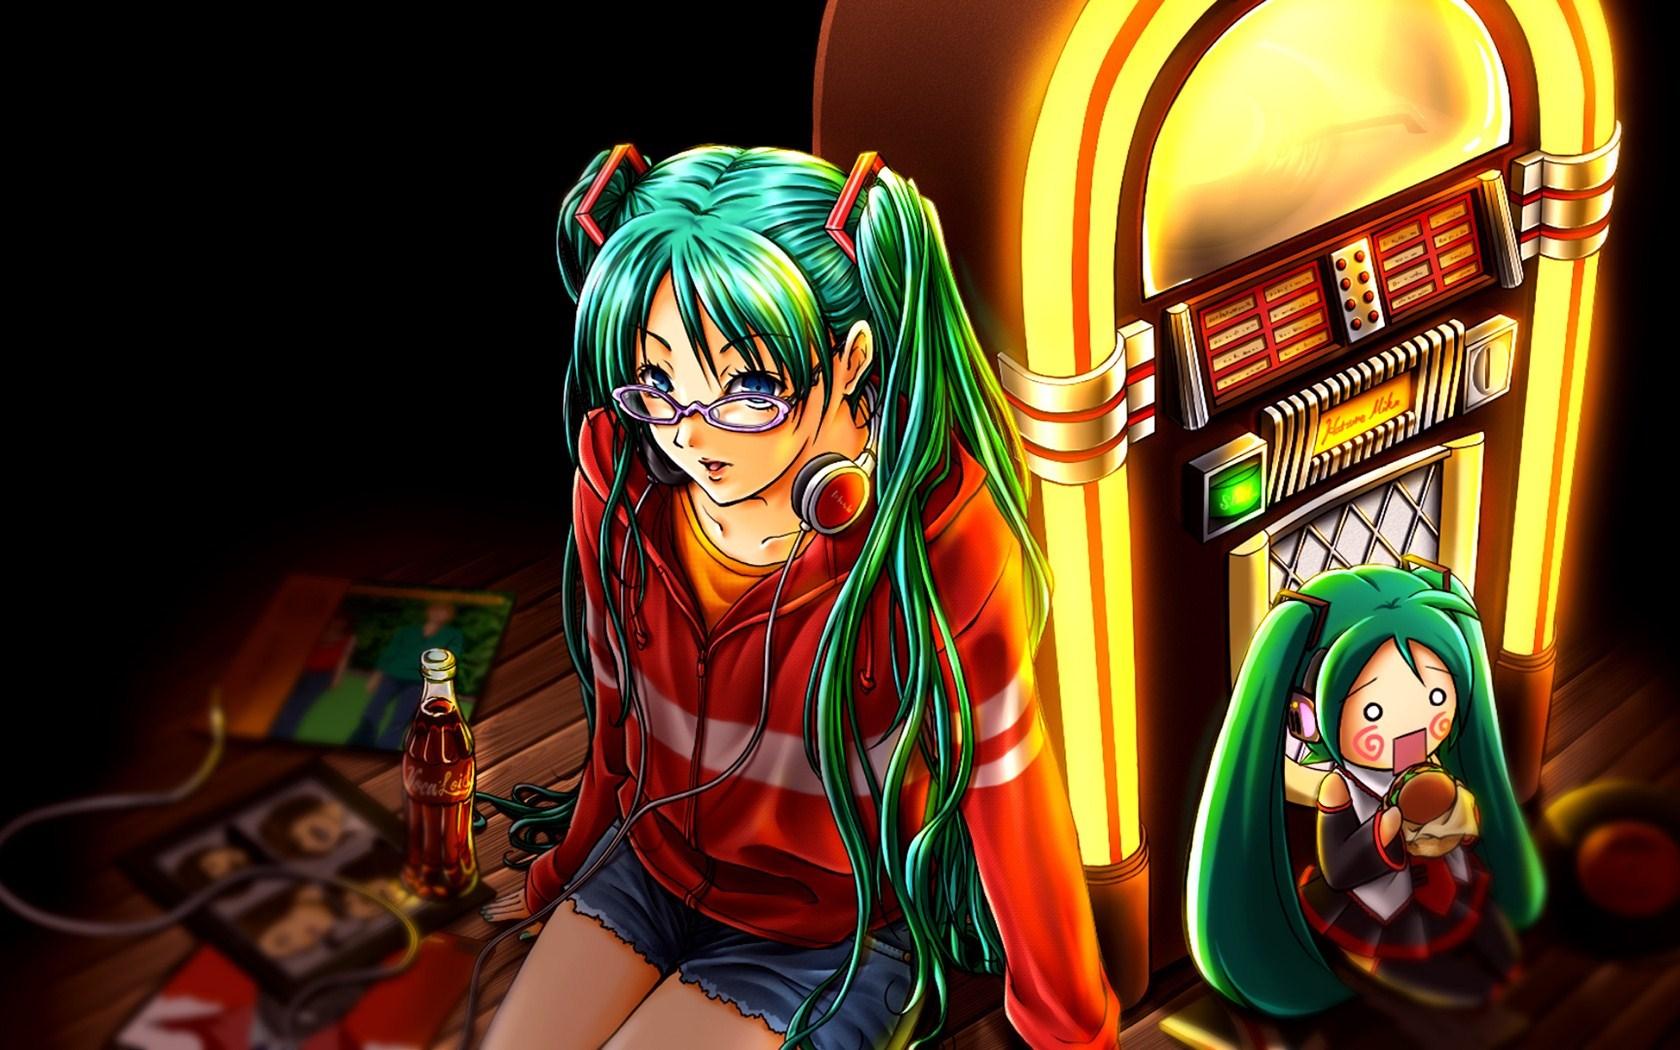 Anime Girl Hatsune Miku Headphones Coca-Cola Jukebox